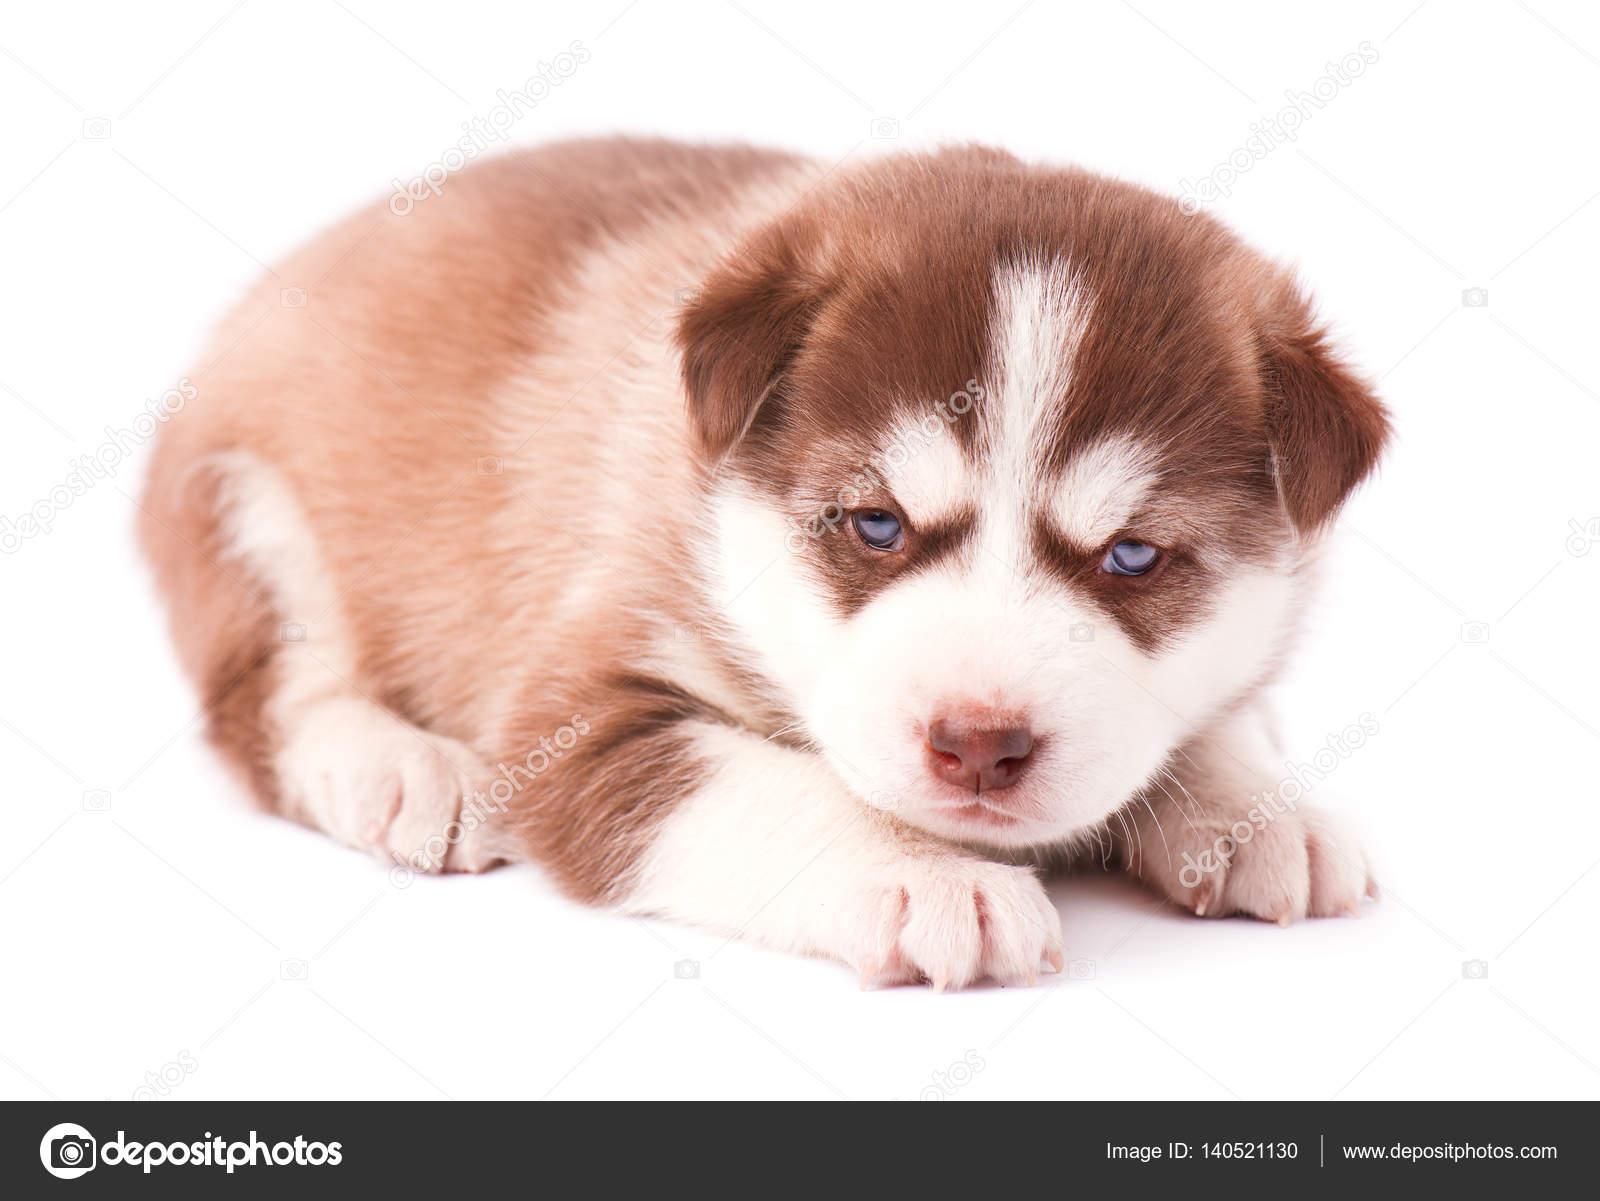 Cute Baby Husky Puppies Cute Siberian Husky Puppy Stock Photo C Vandycandy 140521130